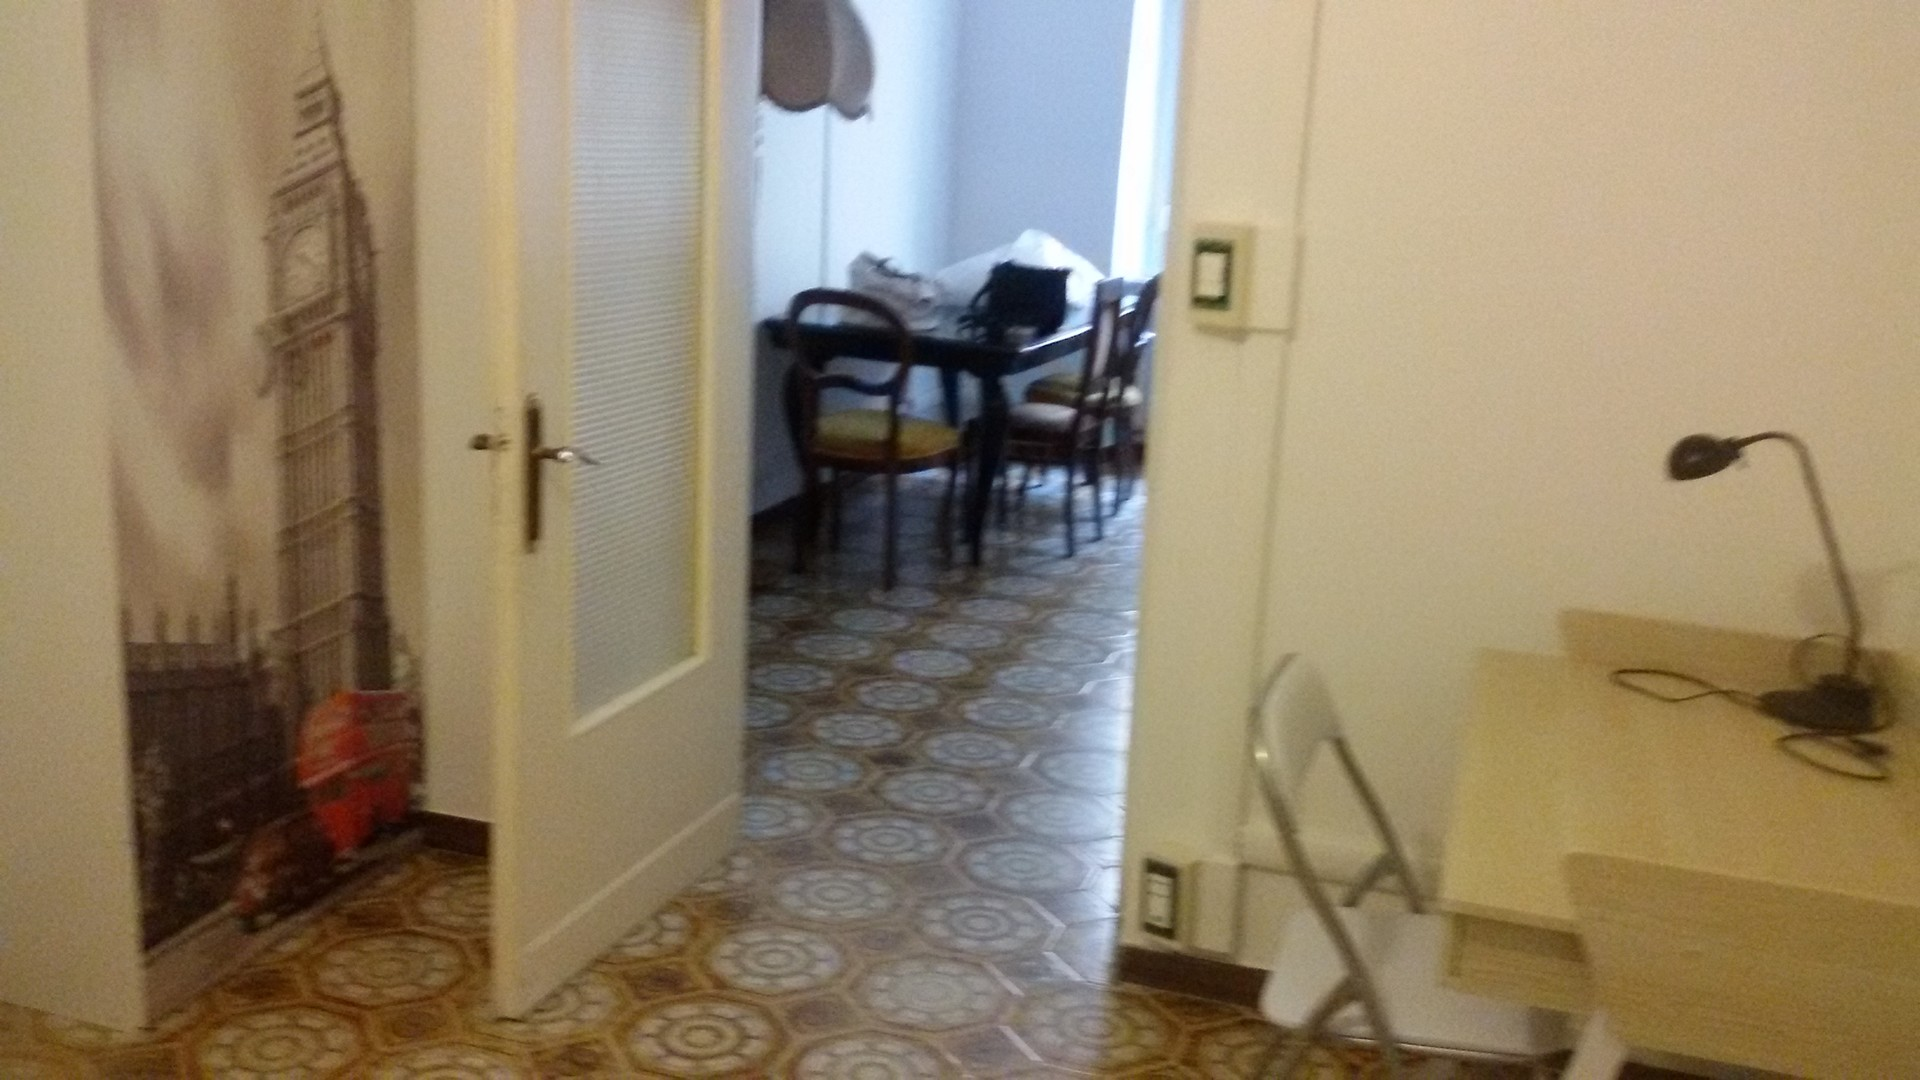 appartamento-genova-centro-luminoso-ed690fbd6948b1068c24dcb35bf97042